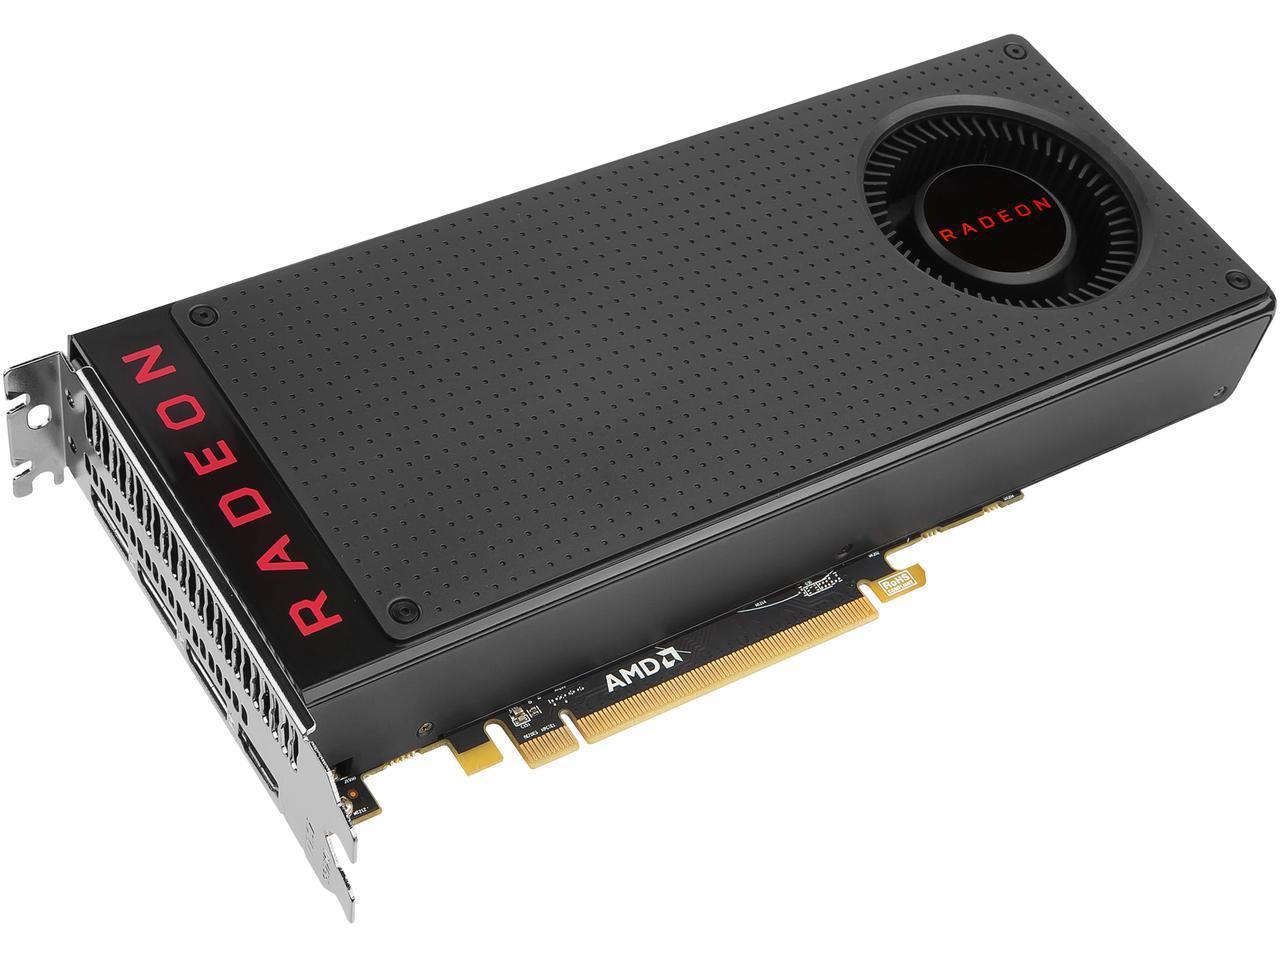 Details about MSI Radeon RX 480 4GB Blower GDDR5 AMD Video Card Graphics GPU